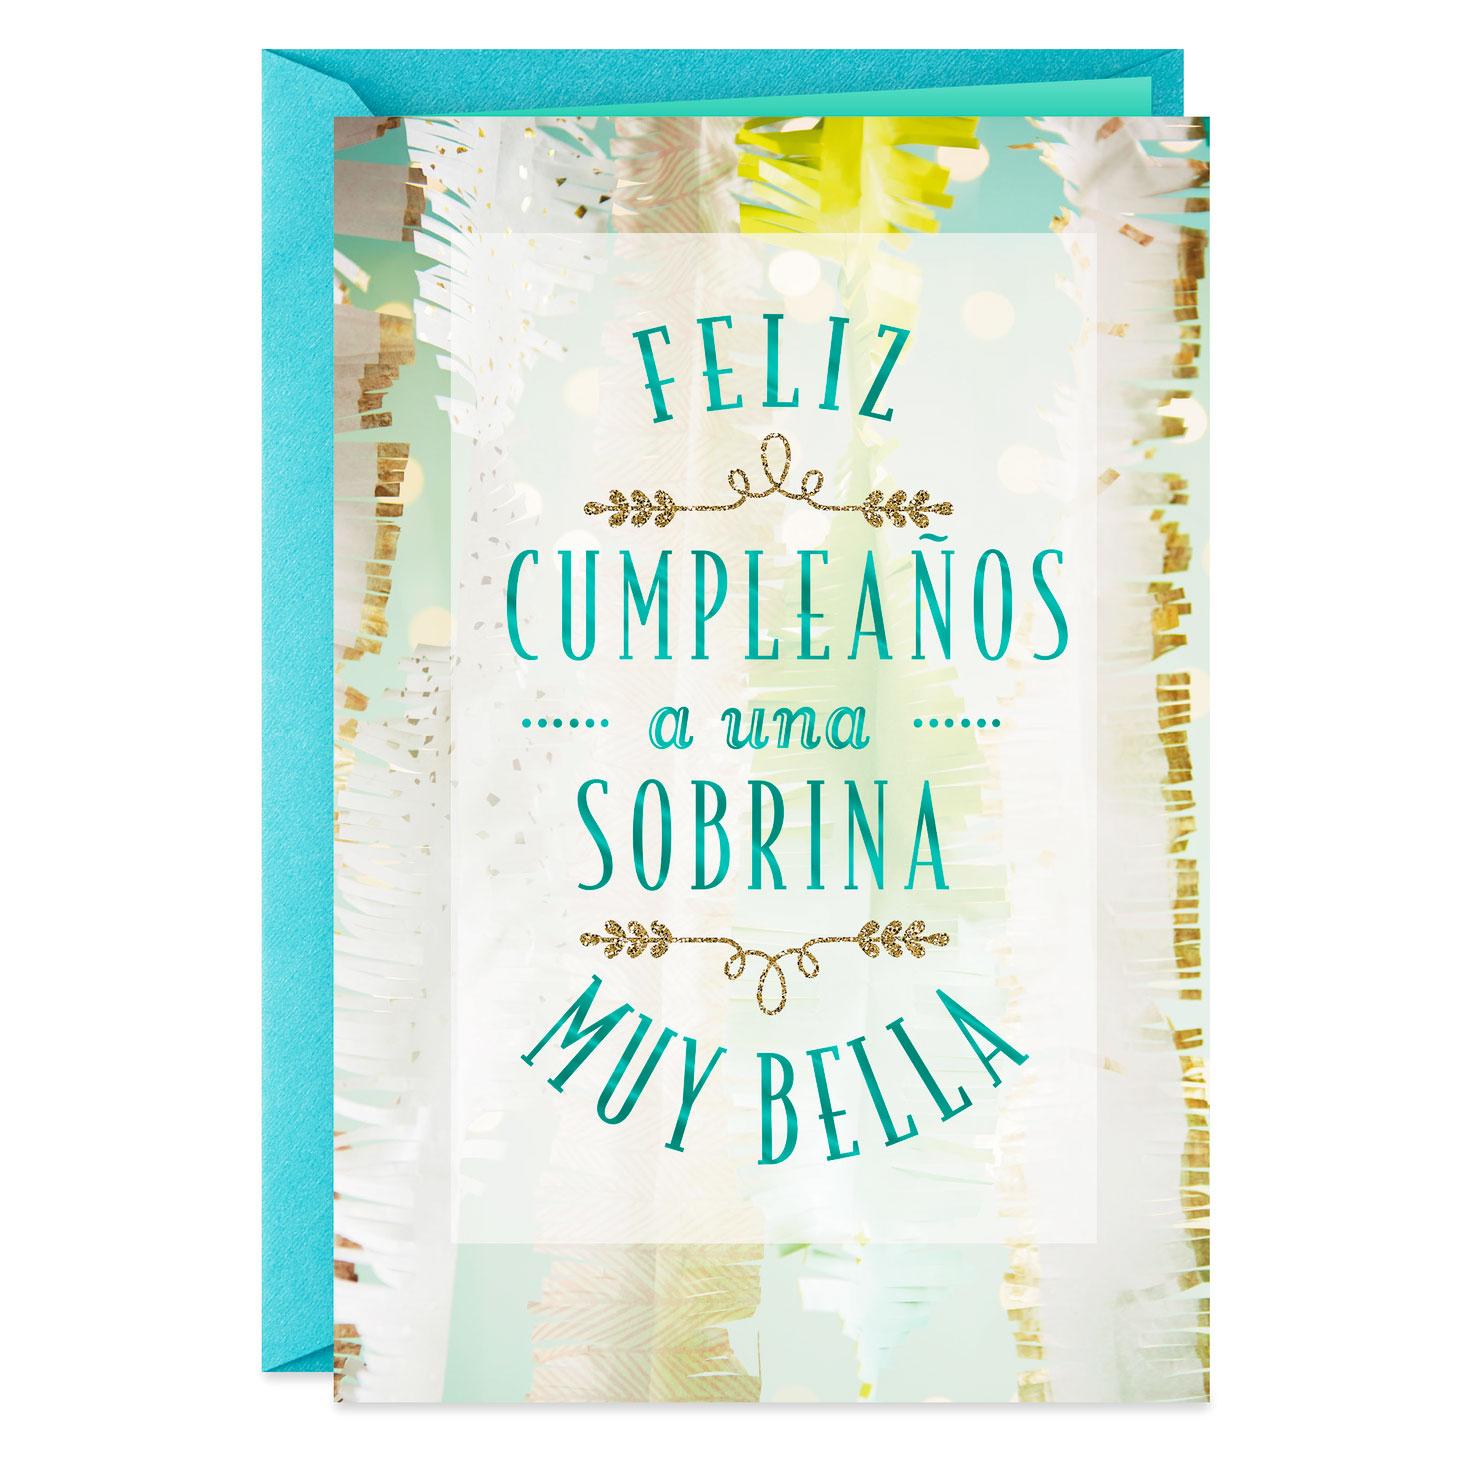 for a beautiful niece spanishlanguage birthday card